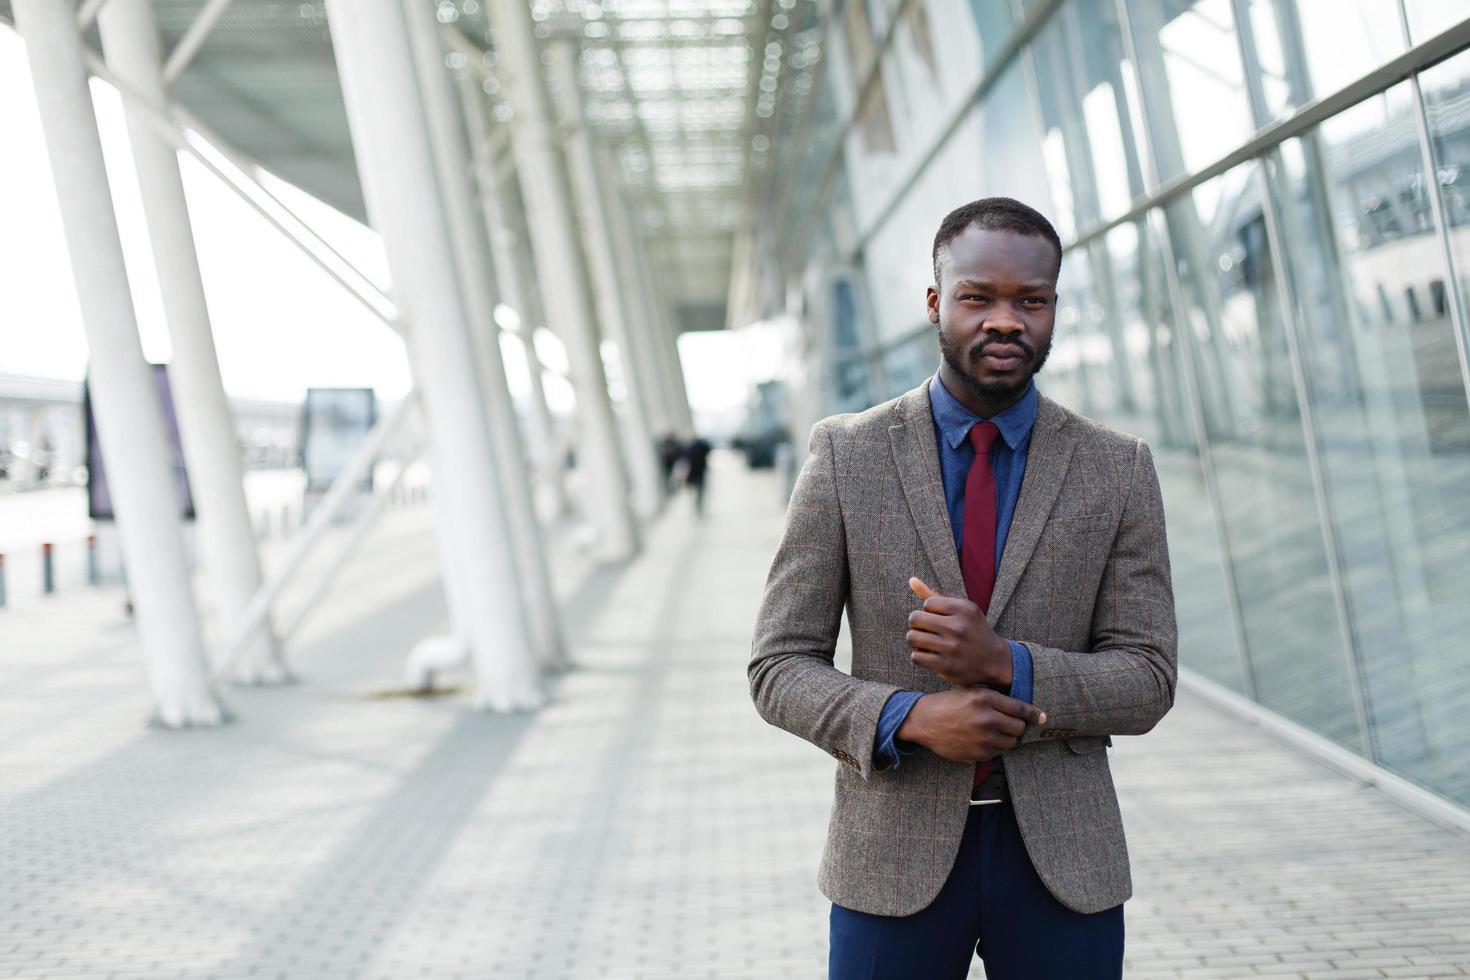 Man in a suit walking photo